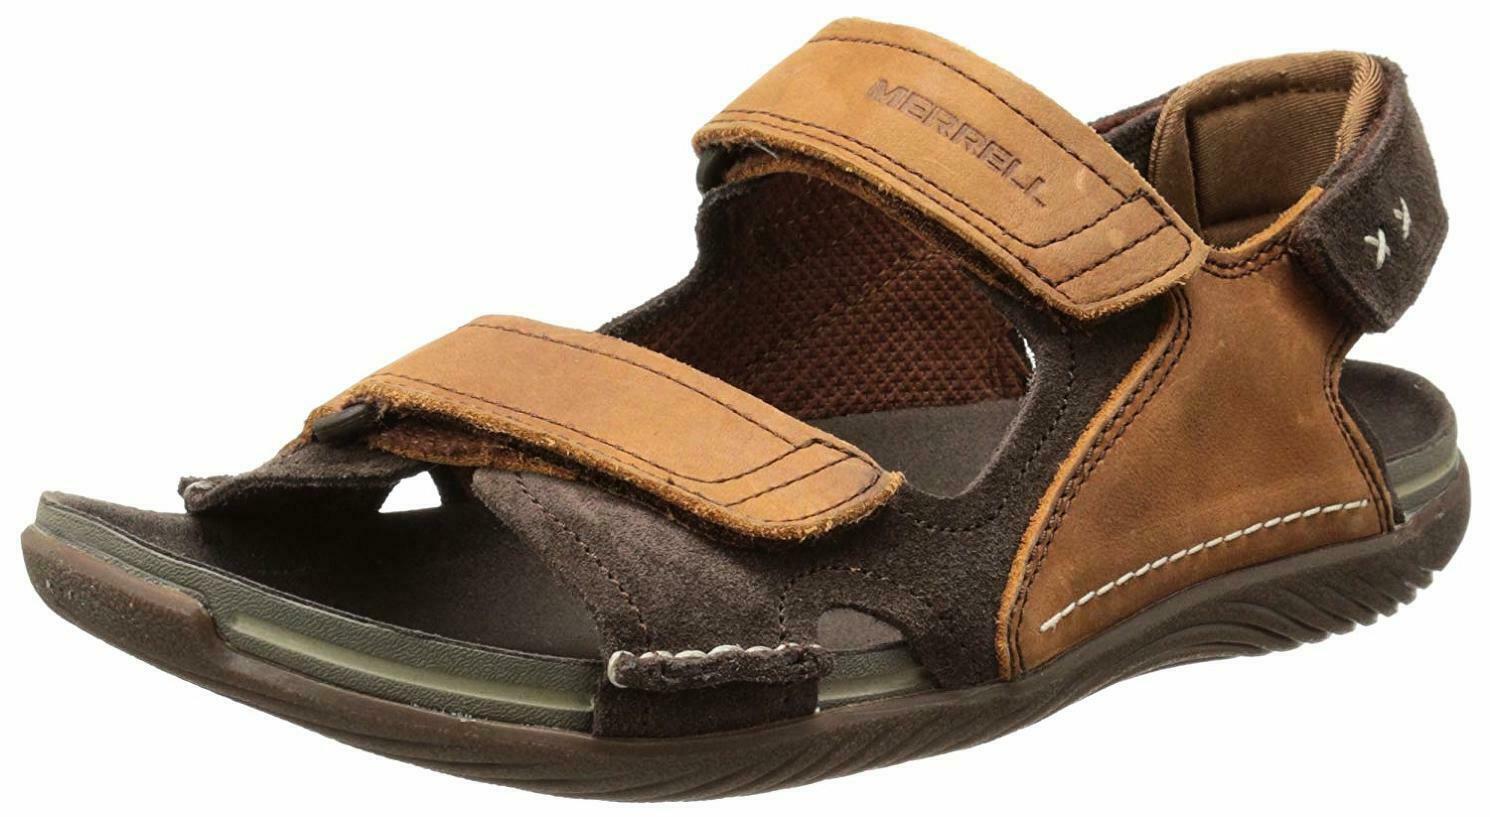 eaa471ca12ce Merrell Men s Bask Duo Sandal - Choose and 23 similar items